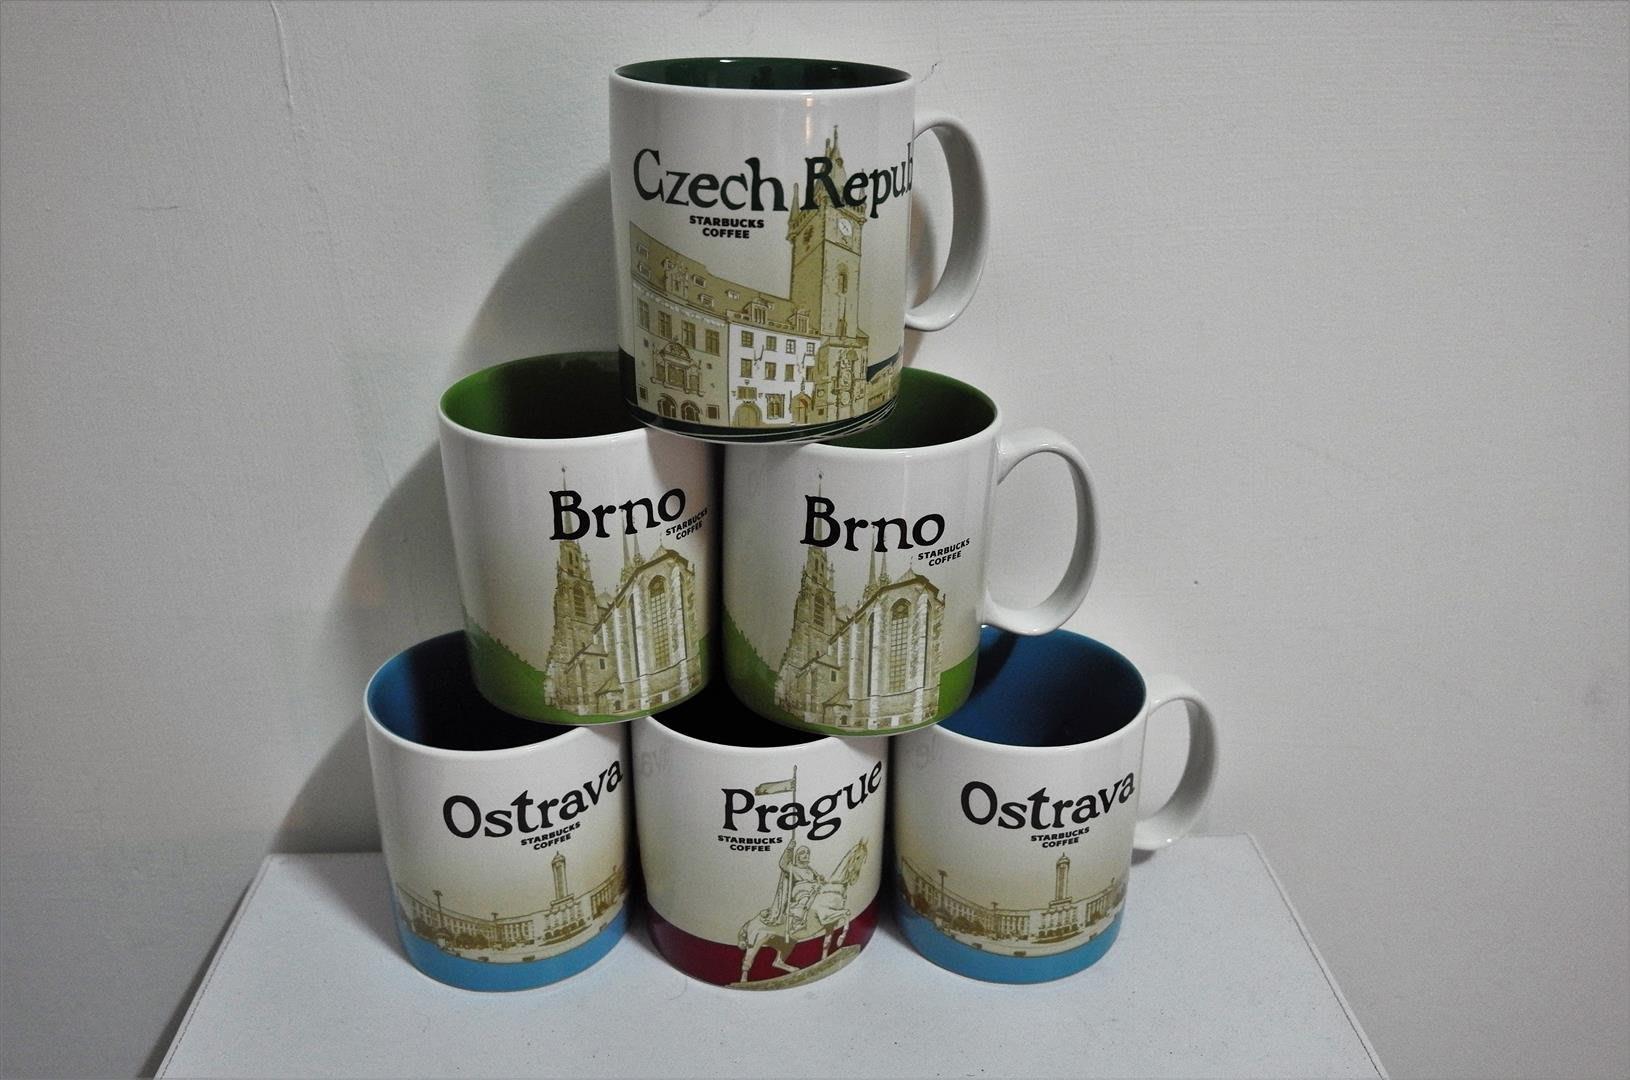 Czech Prague Brno Ostrava 星巴克 STARBUCKS City Mug 城市 馬克杯捷克布拉格